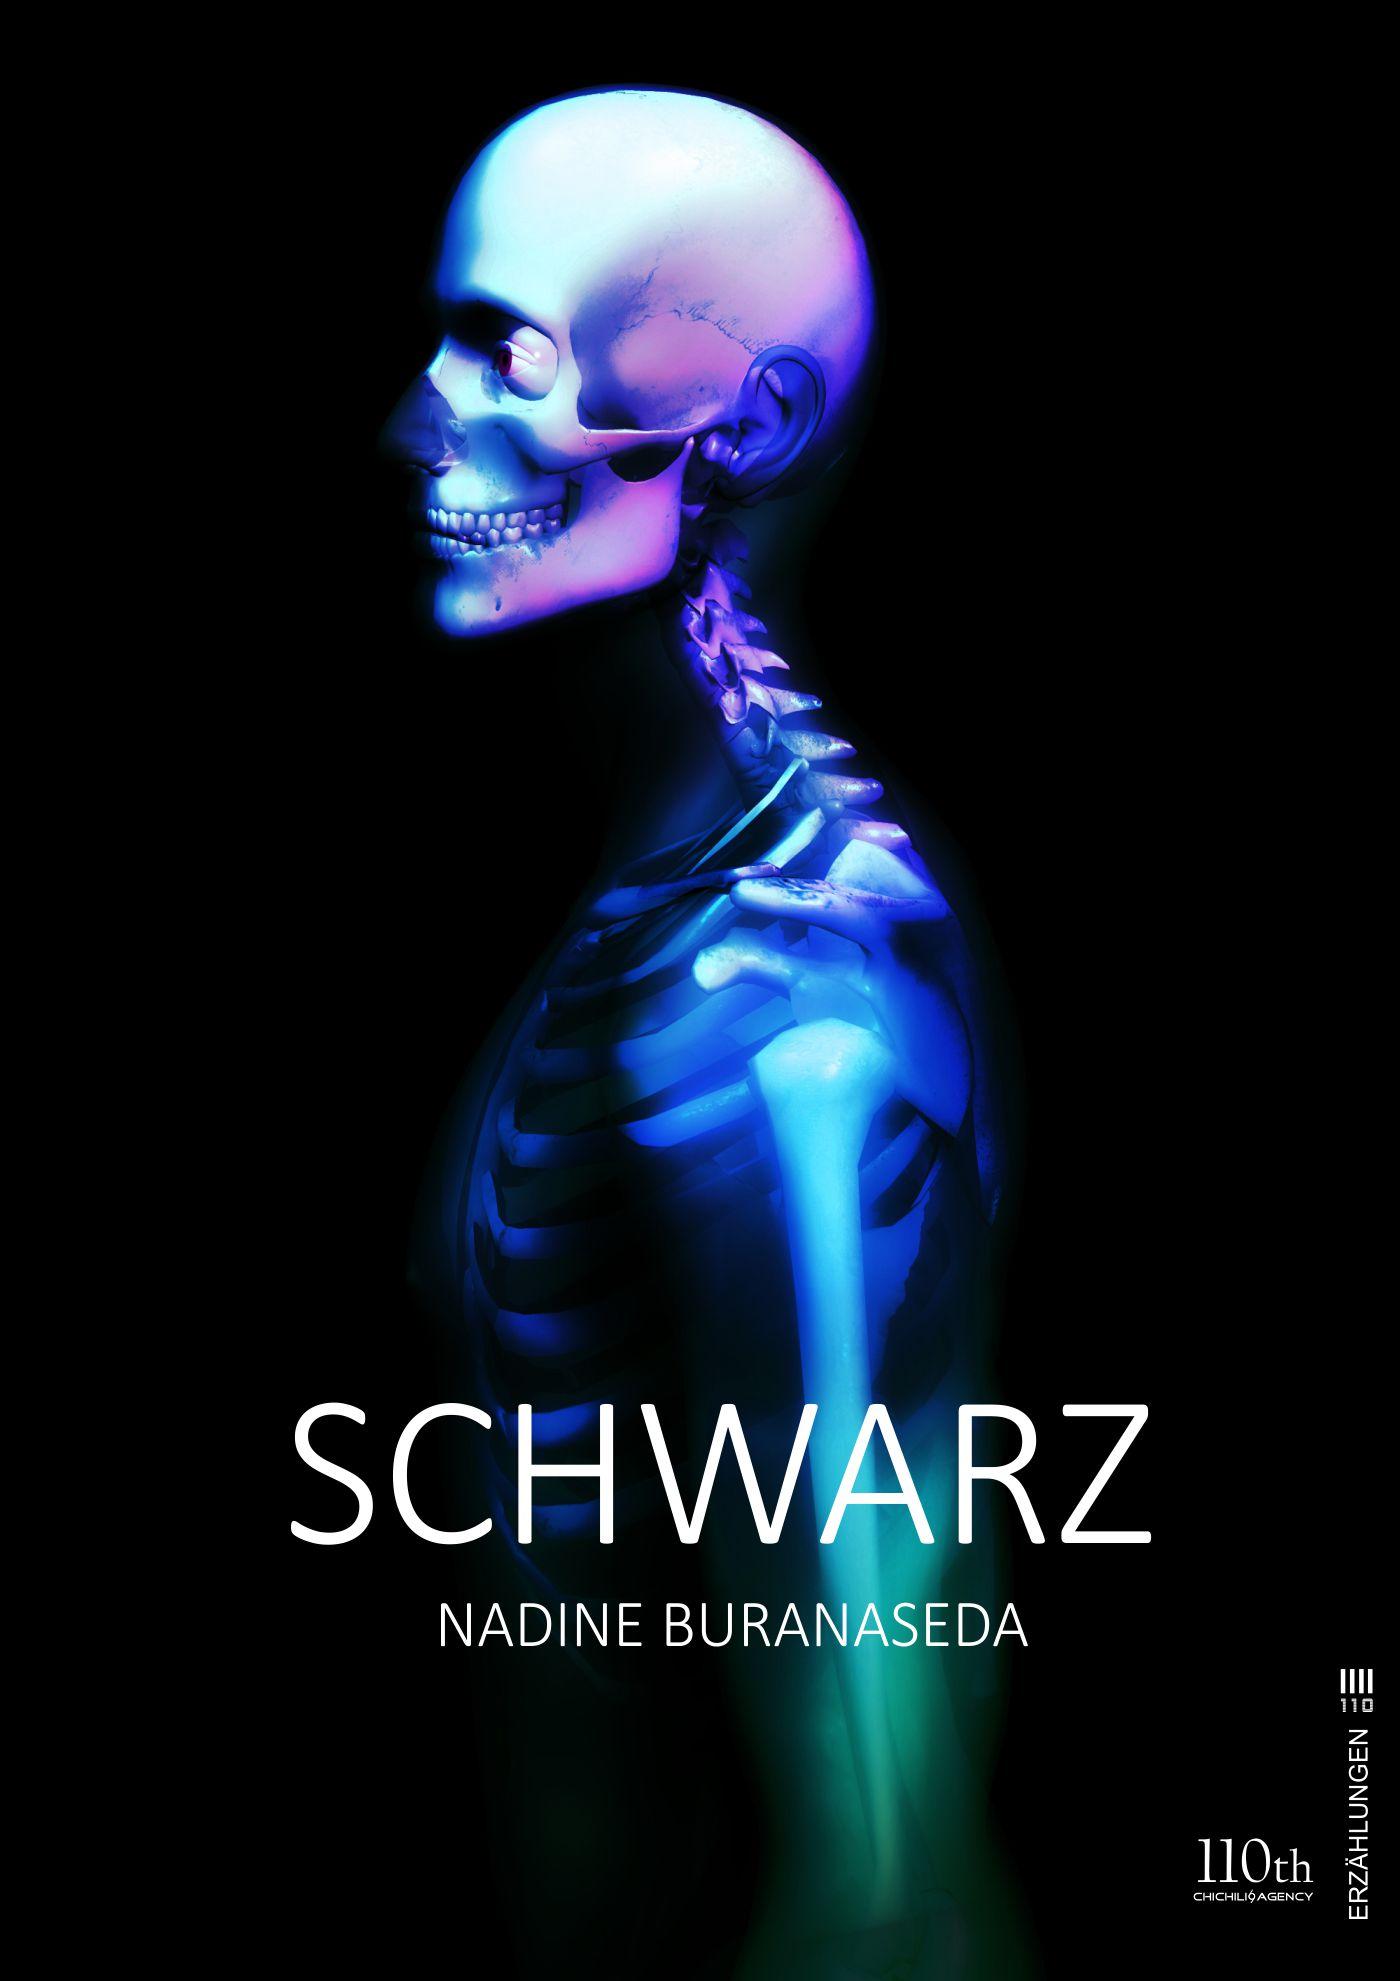 Nadine Buranaseda Schwarz nadine traulsen beschleunigtes magnetic particle imaging